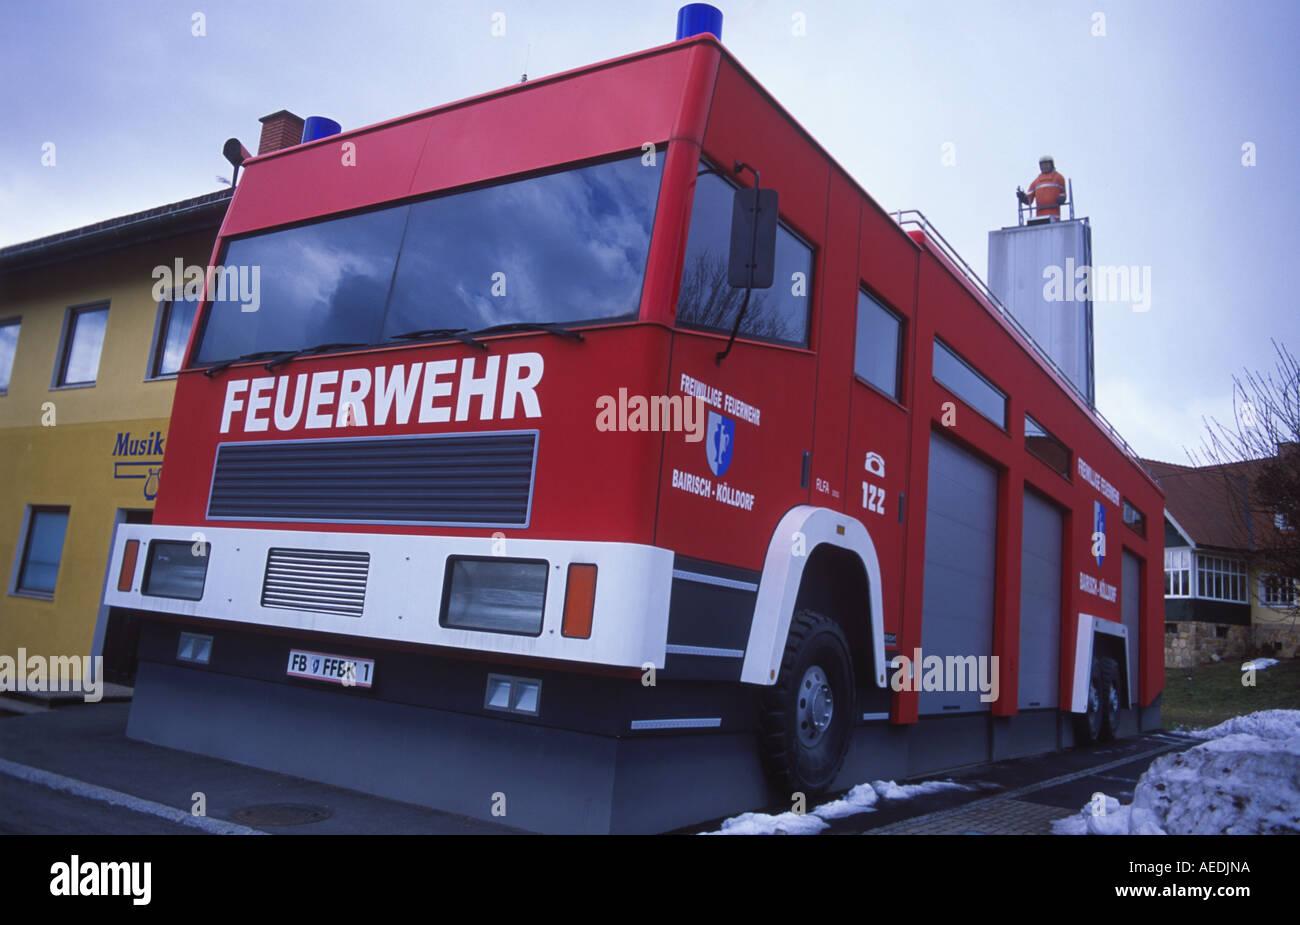 biggest fire brigade car of the world fire brigade house stock photo 7800537 alamy. Black Bedroom Furniture Sets. Home Design Ideas